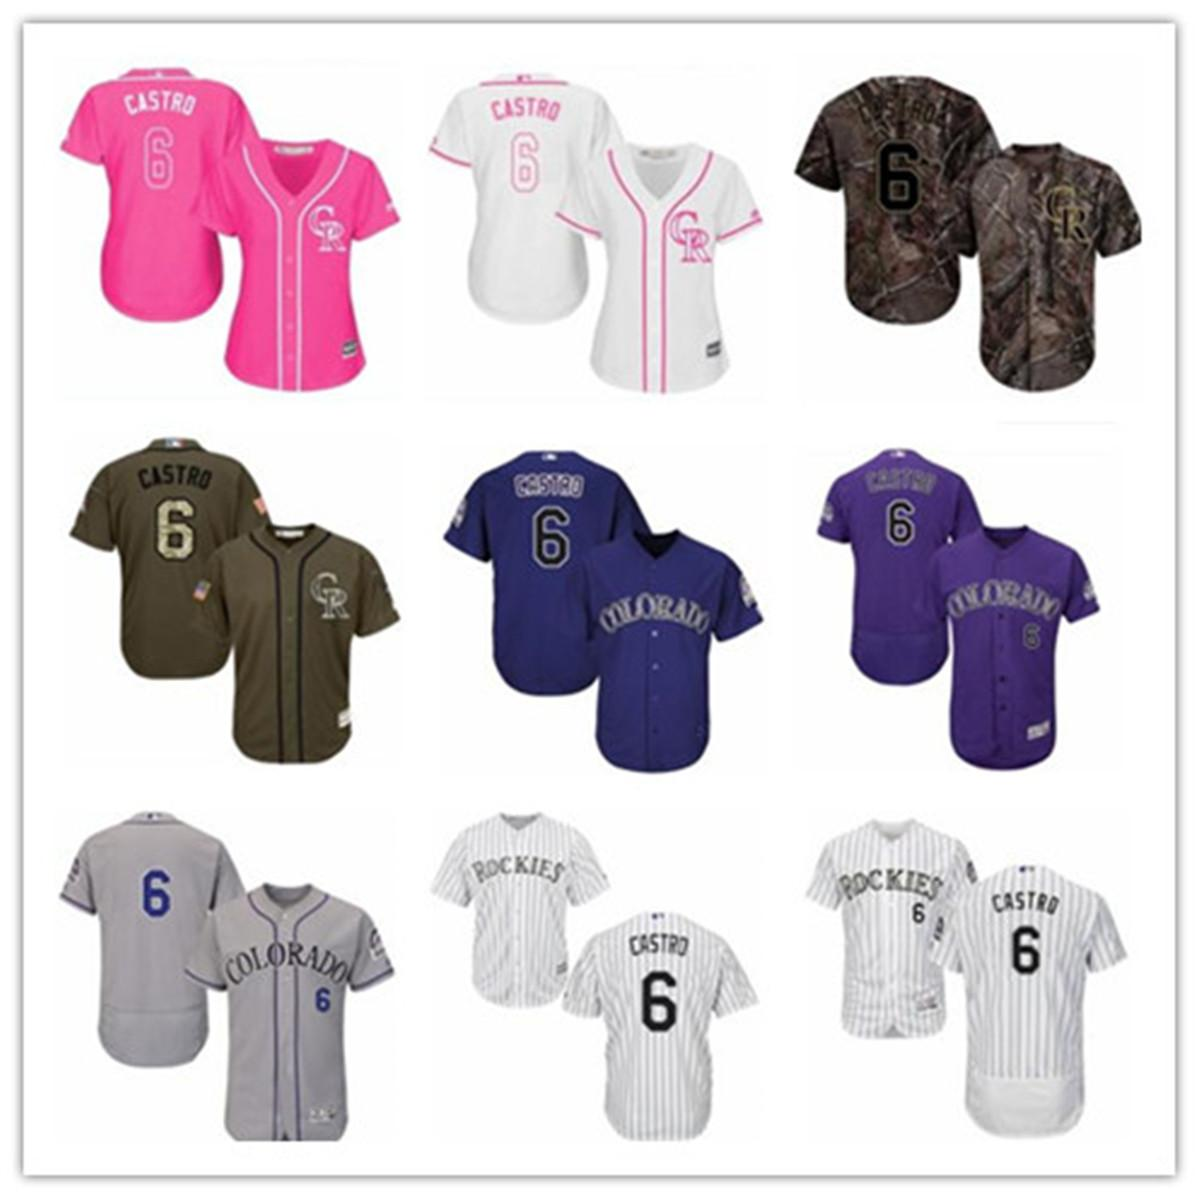 freies Schiff individuelle Colorado Colorado Rockies 6 Daniel Castro T-Shirt, Rockie Baseball Wear Männer Frauen Jugend Trikots